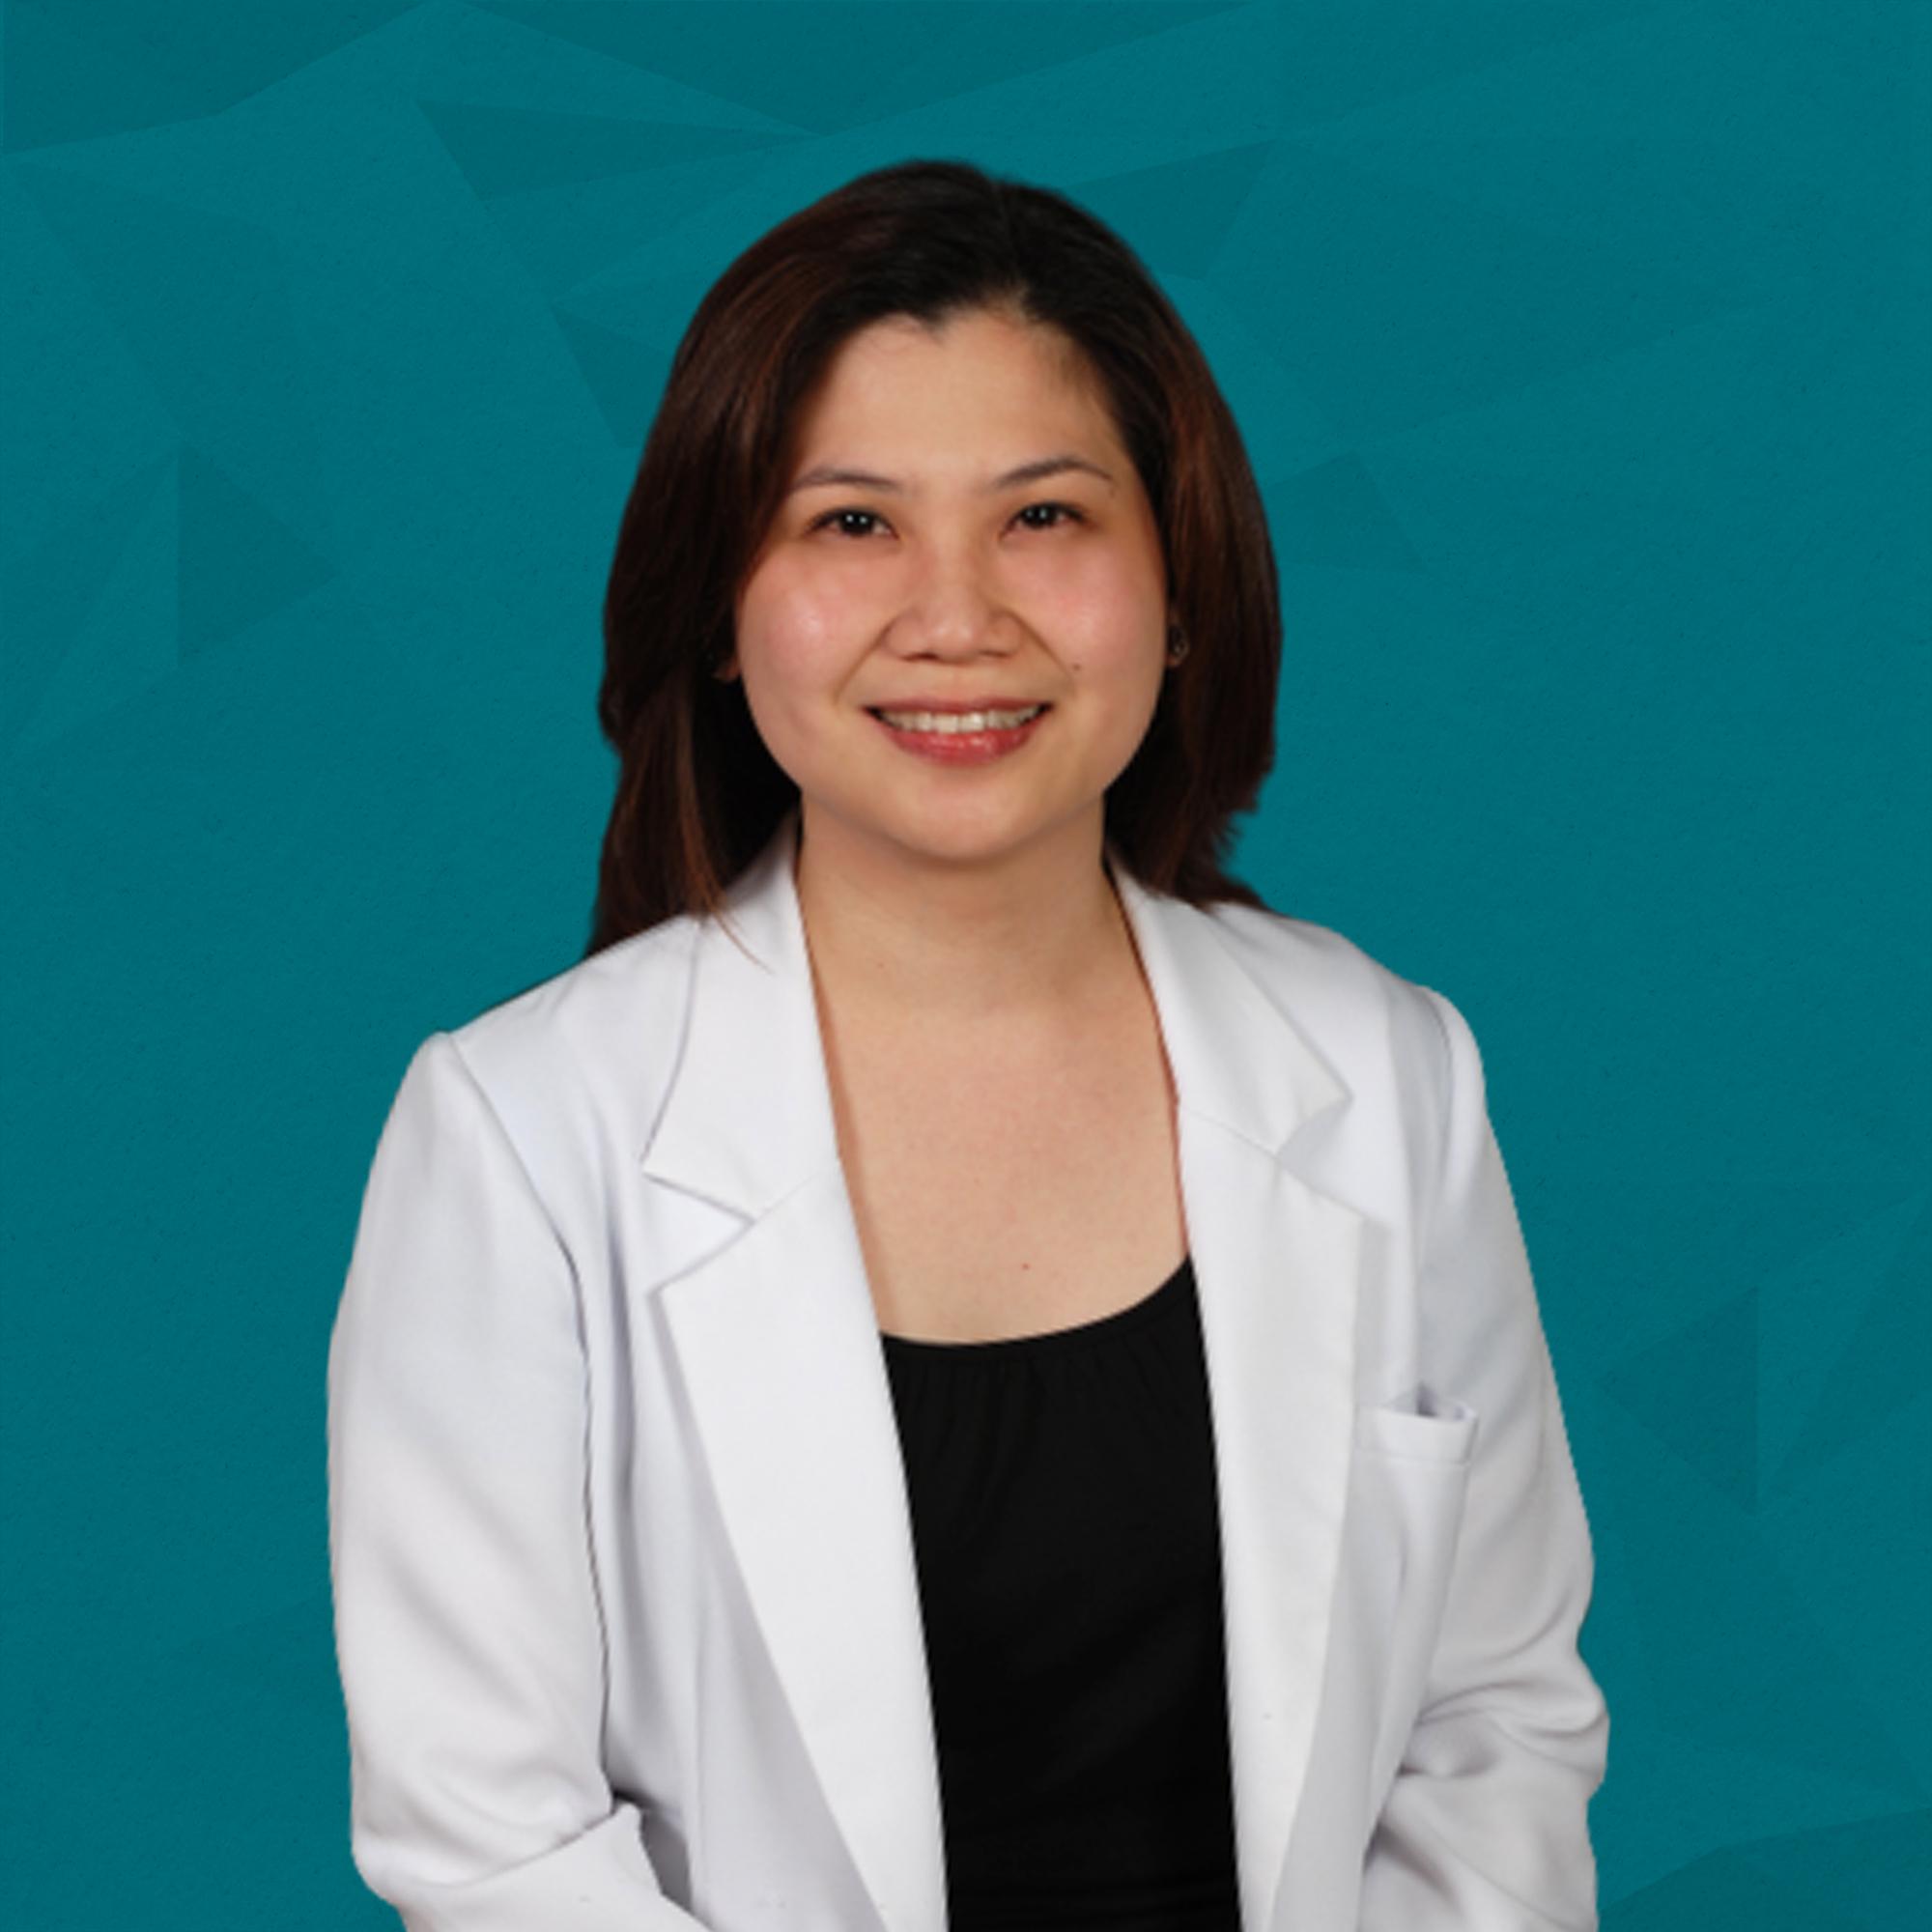 Dr. Espina, Sharyn Crissandra